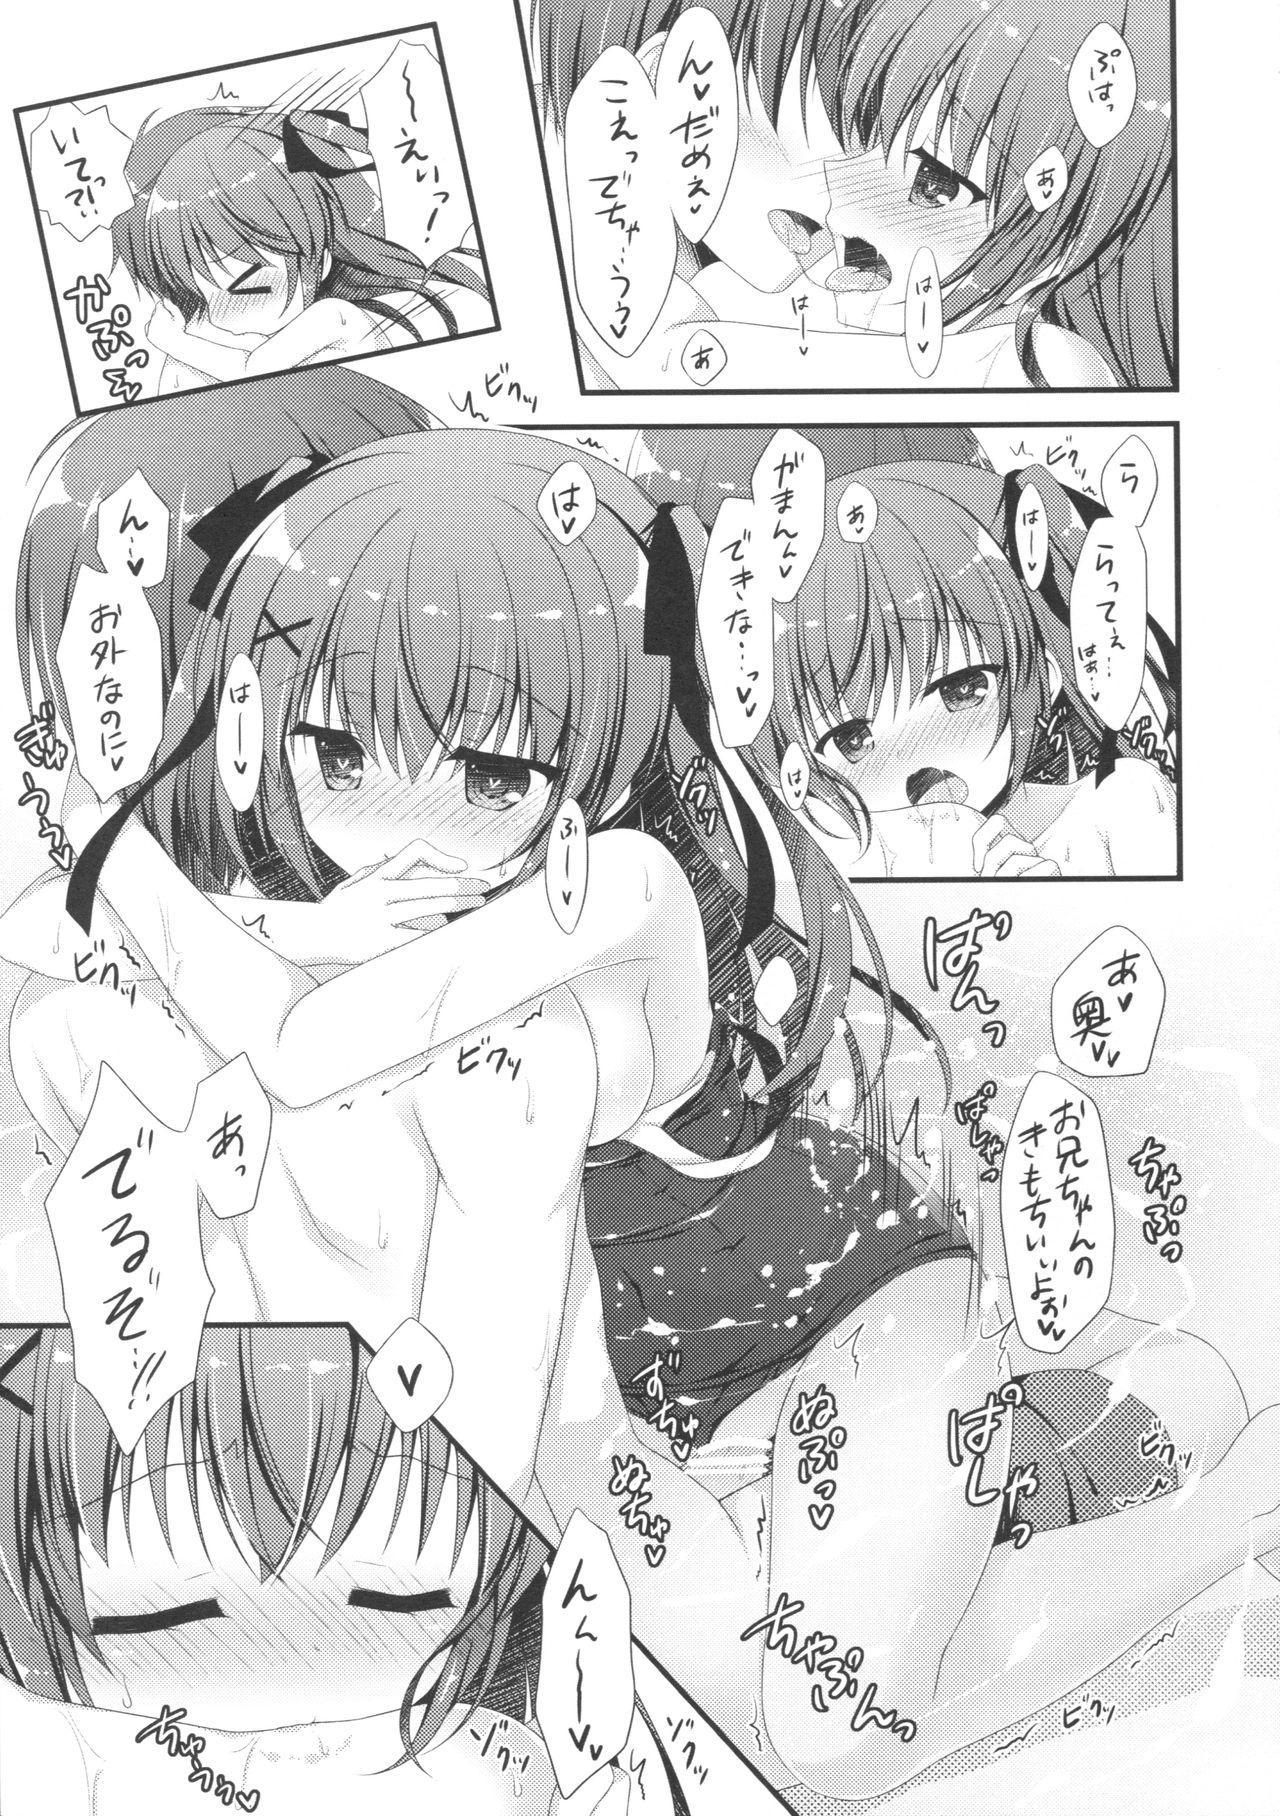 Onii-chan! H nano wa Ikemasen?! summer 17